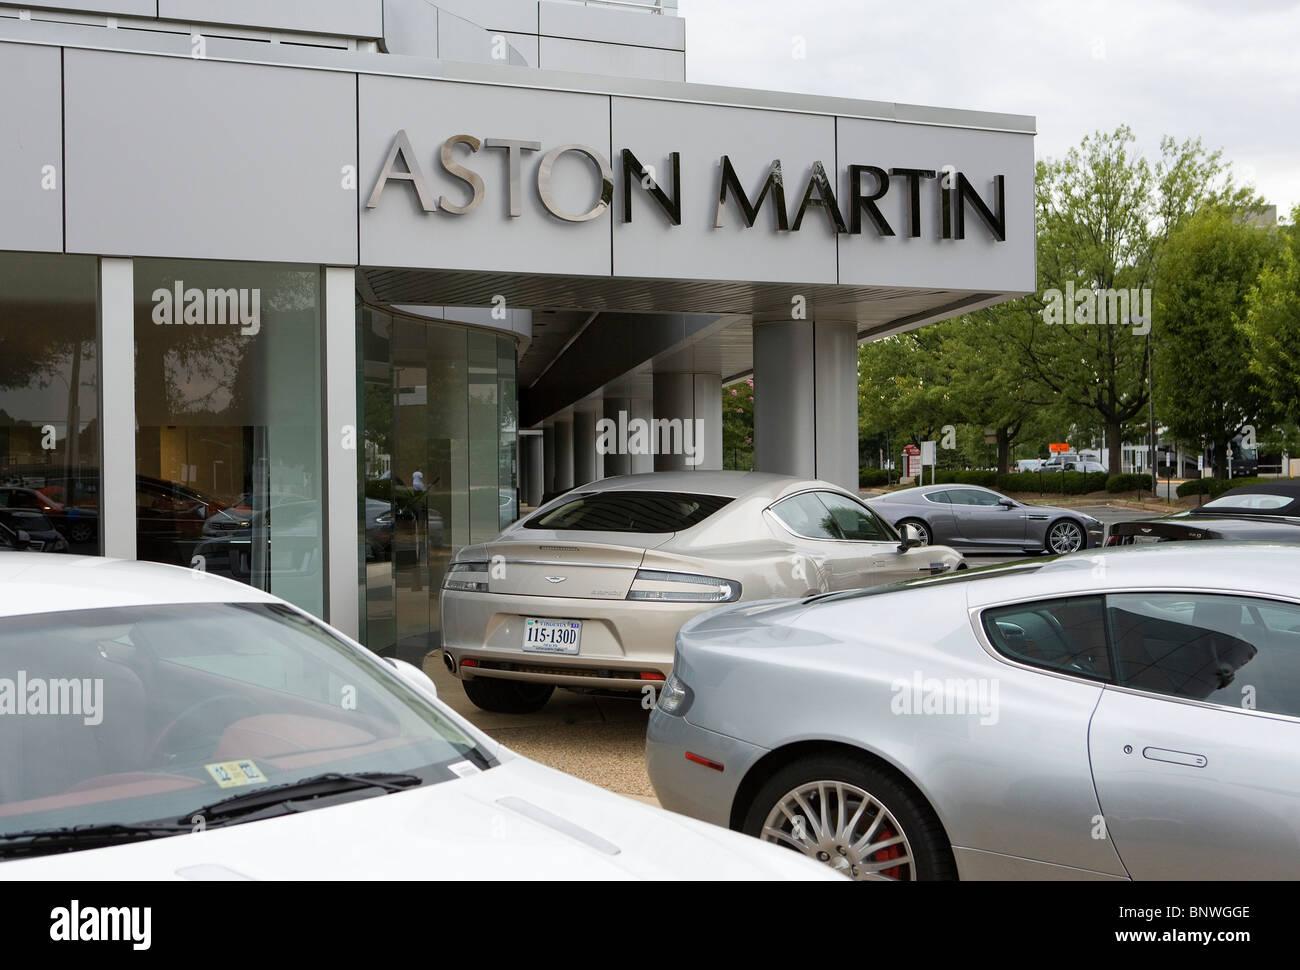 A Aston Martin Car Dealership Stock Photo Alamy - Aston martin car dealers